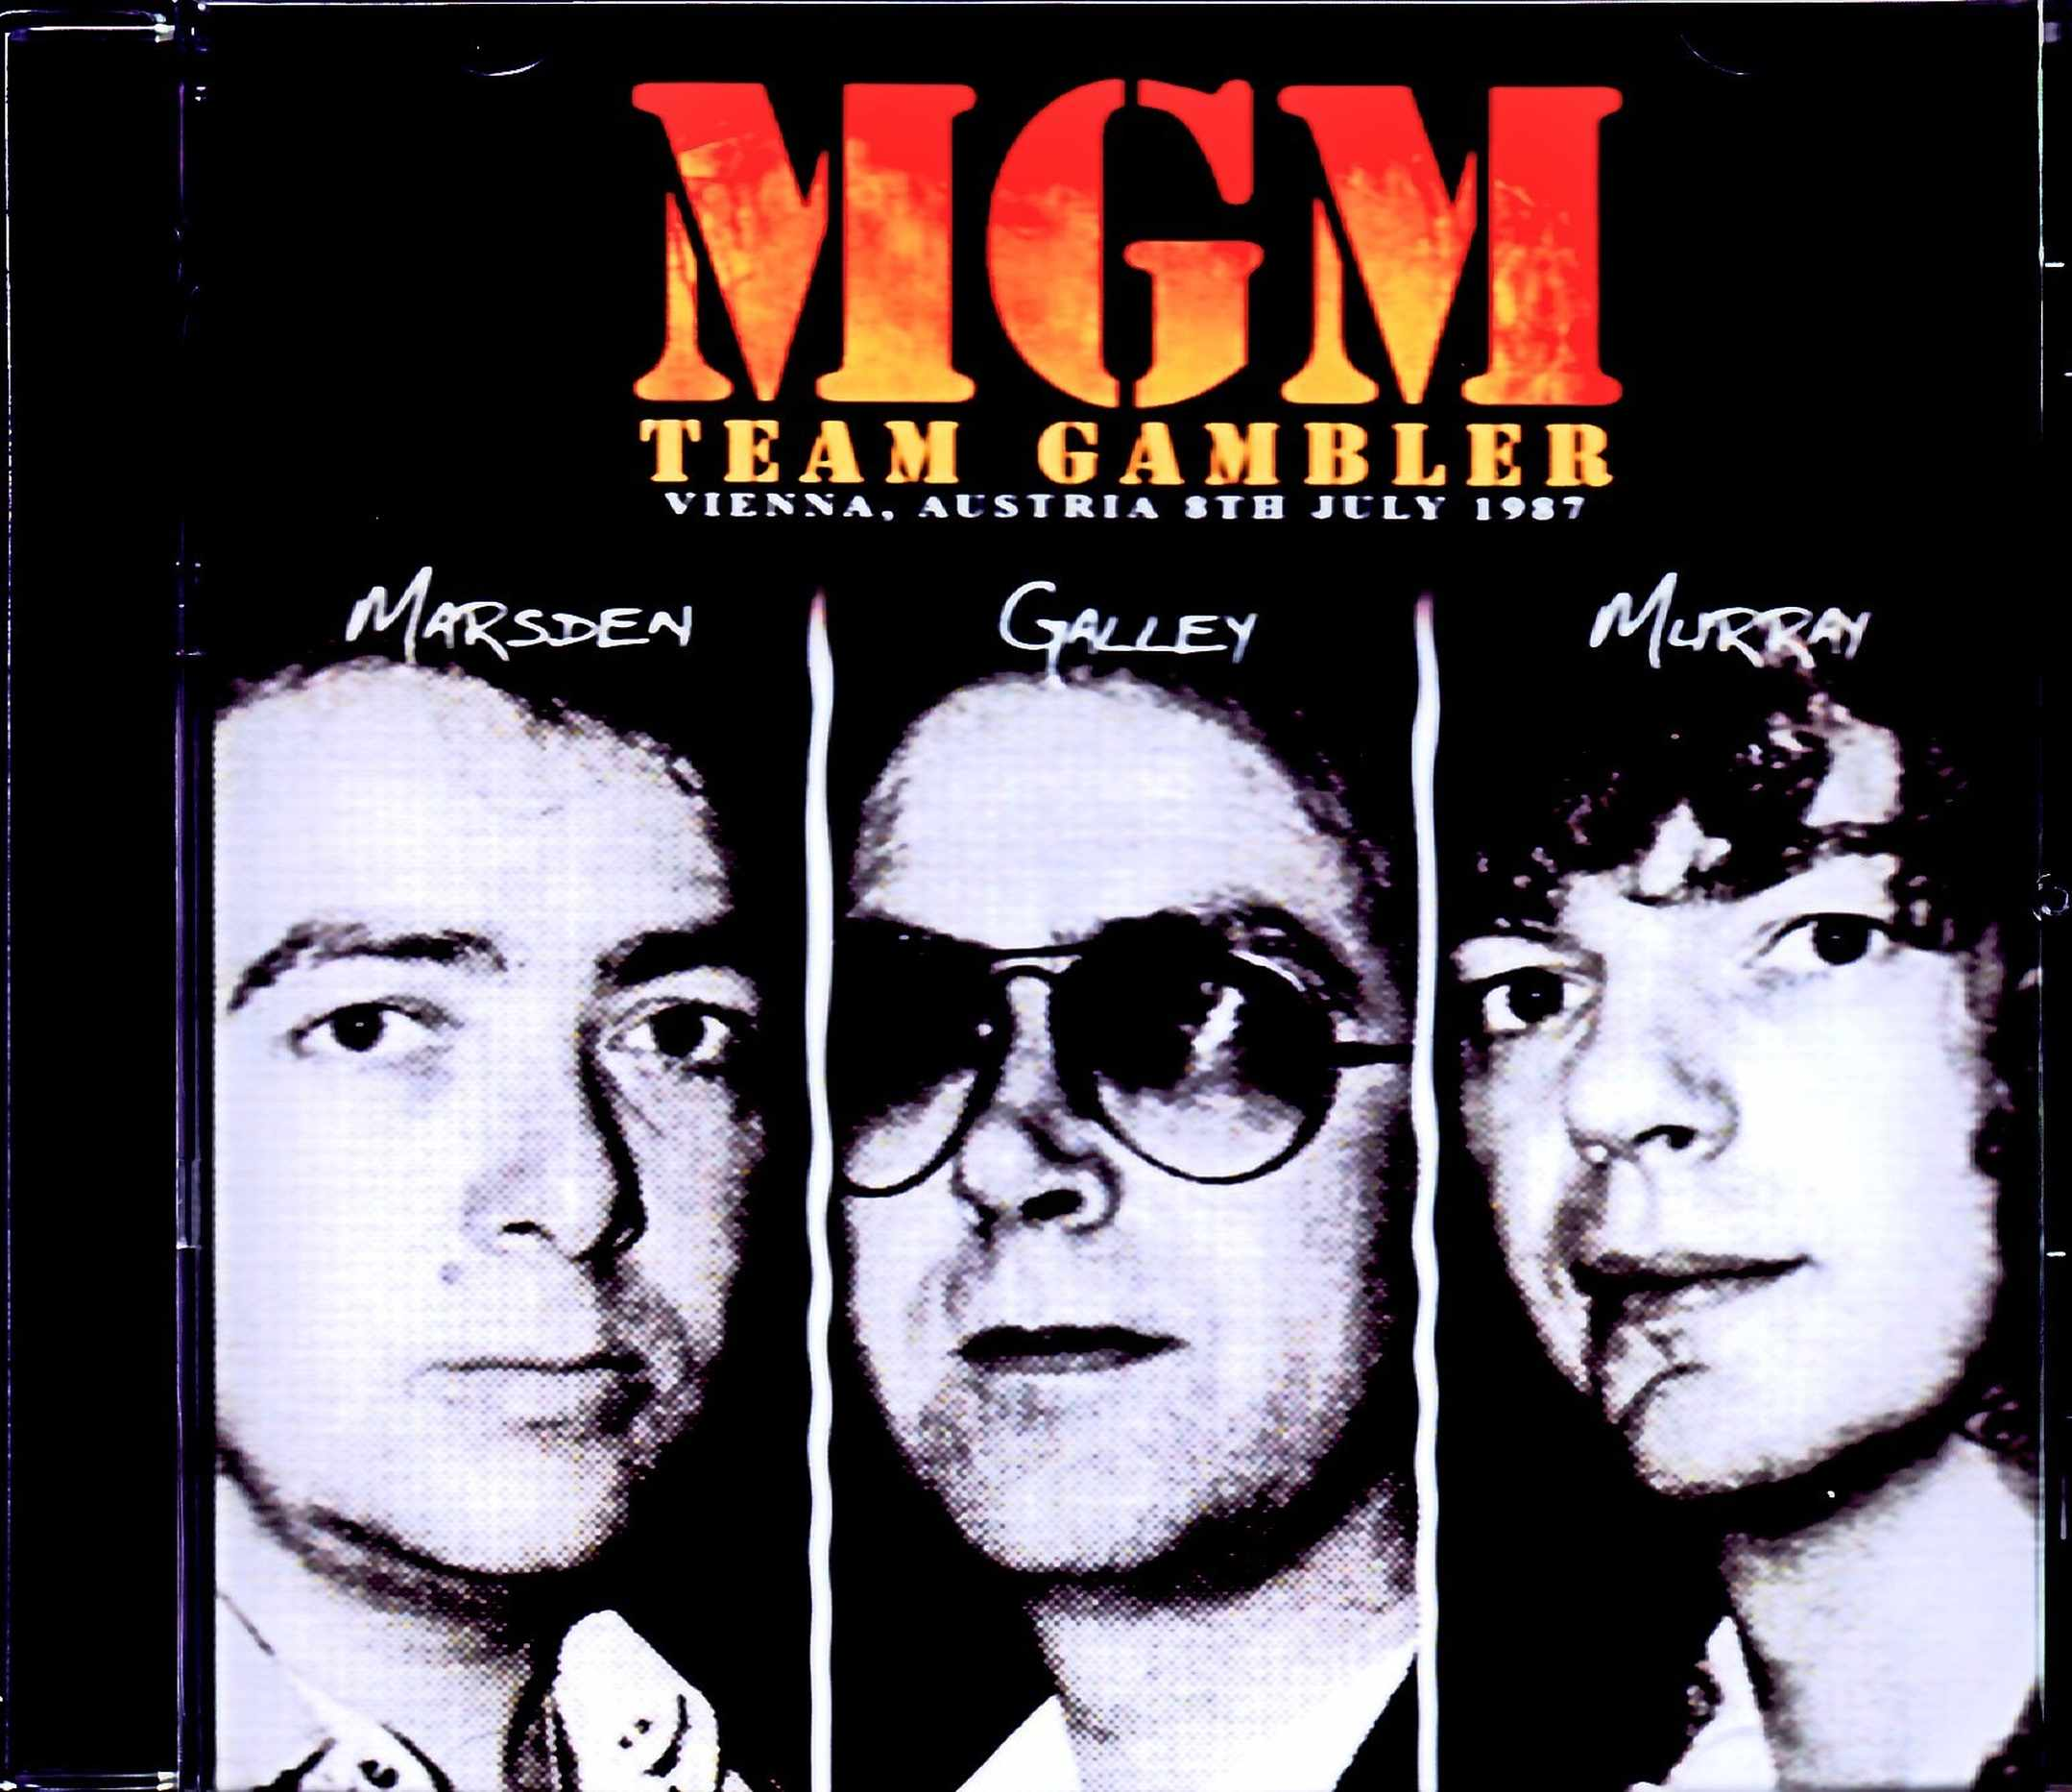 MGM Team Gambler ex. Whitesnake Marsden,Galley & Murray/元ホワイトスネイクのメンバー結集 Austria 1987